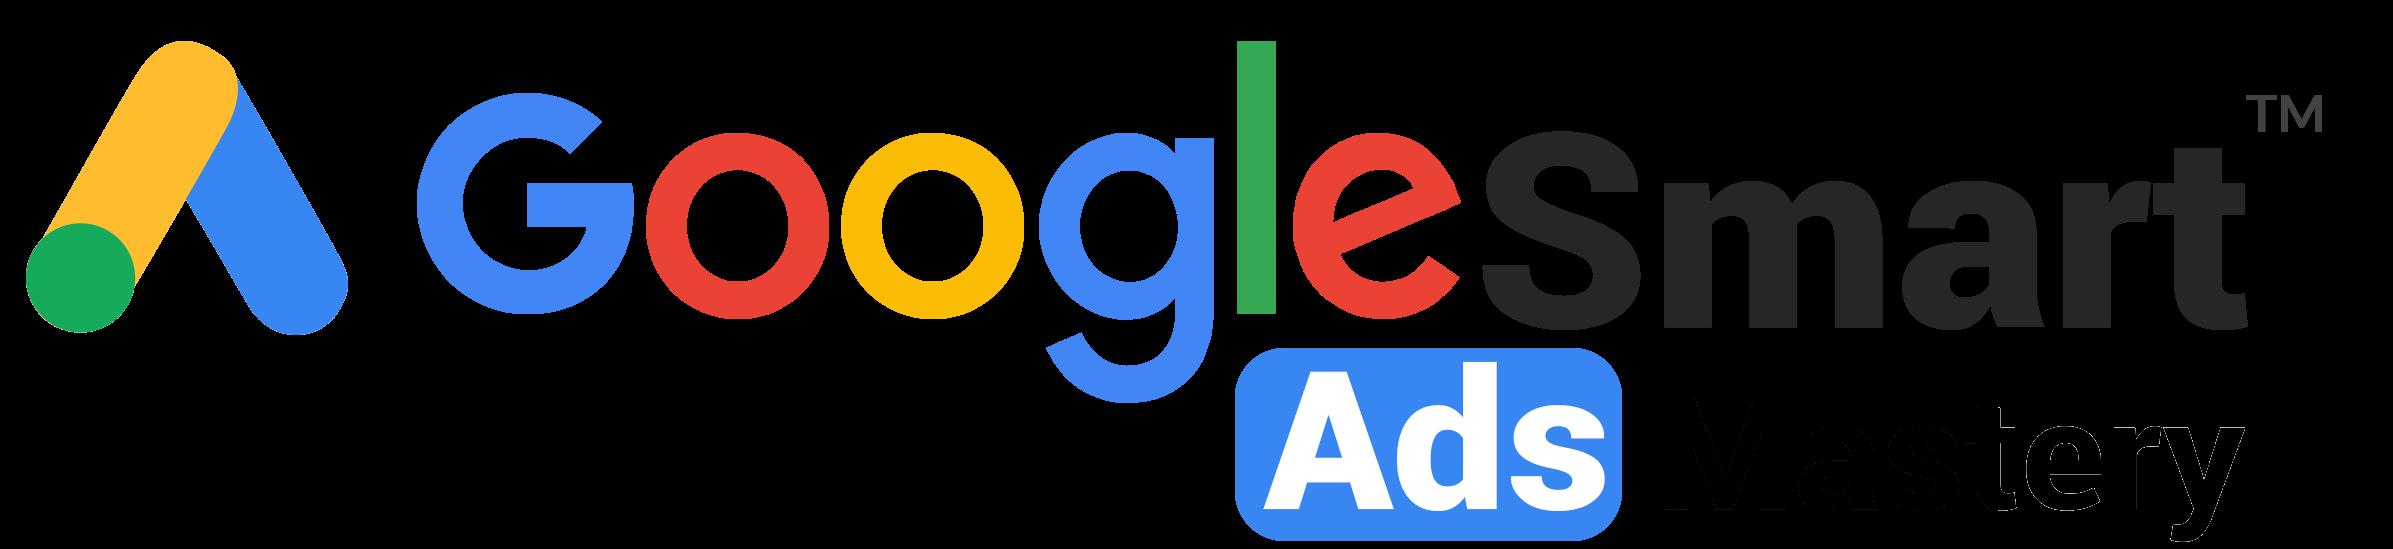 Google-Smart-Ads-Mastery-PLR-Logo